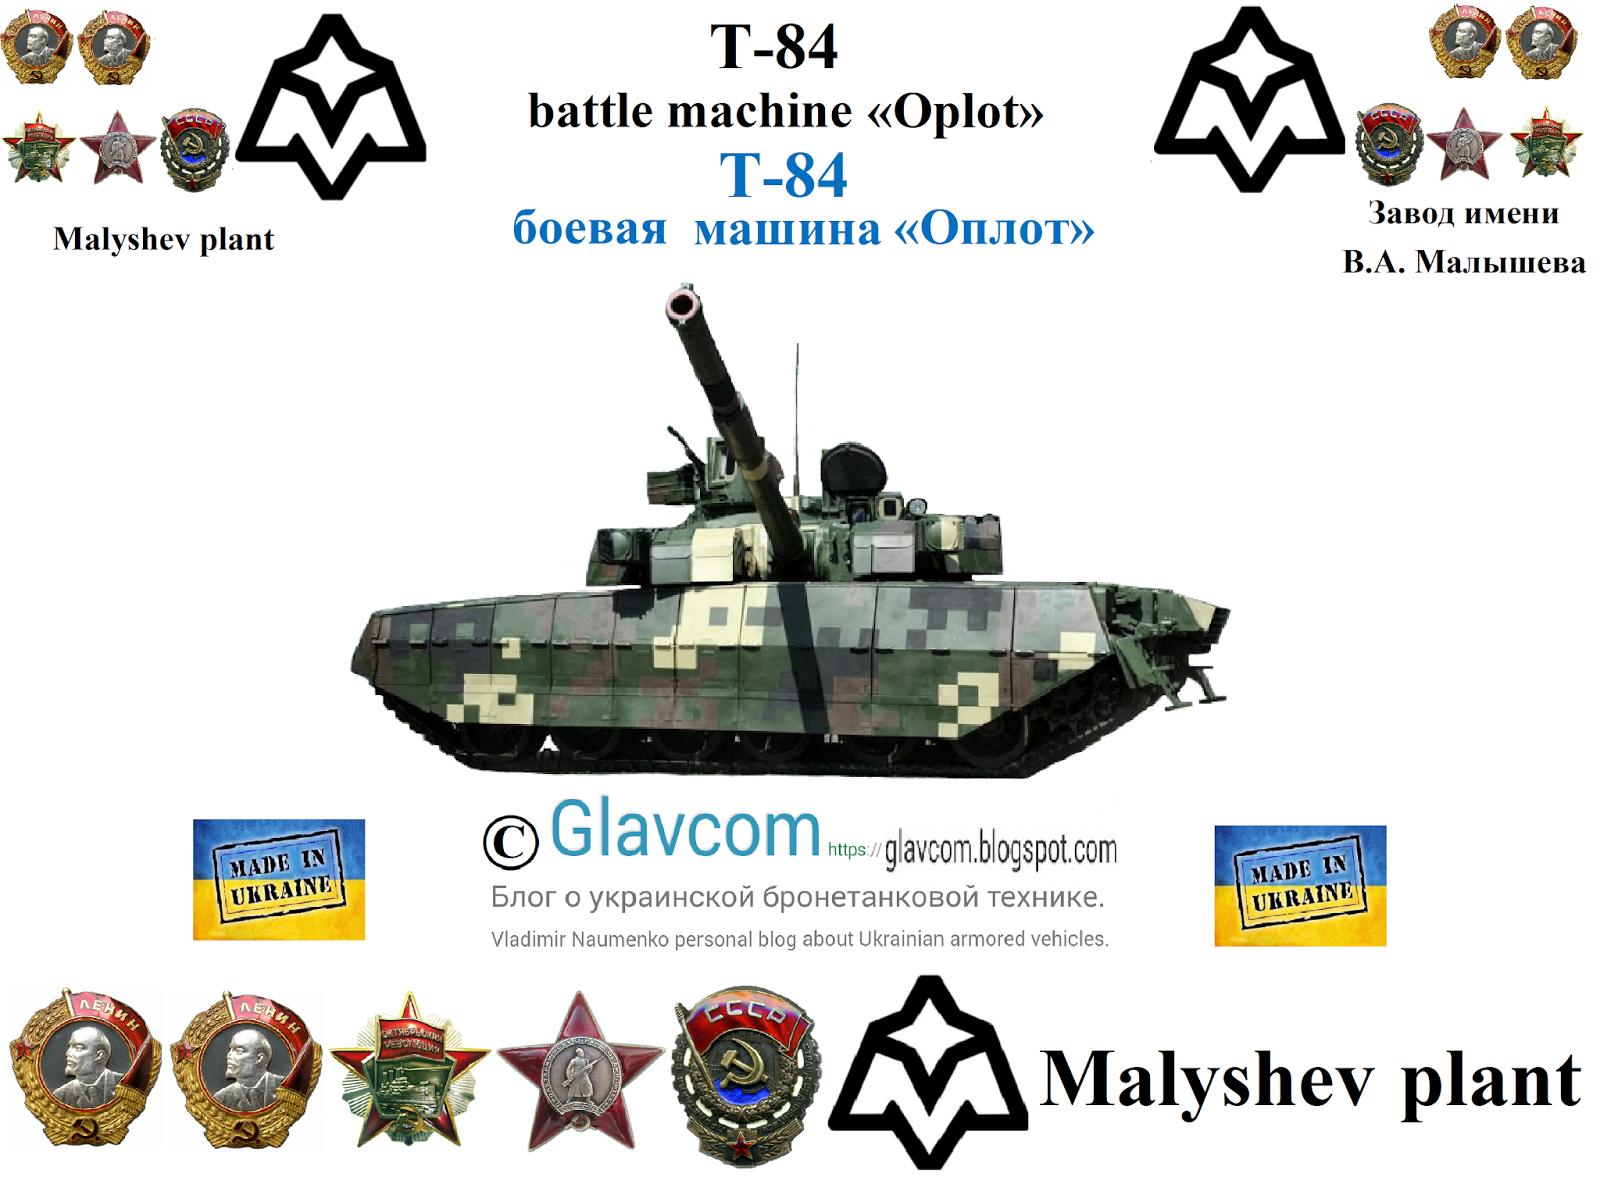 Glavcom: Т-84 БМ Оплот Т 84 БМ Оплот